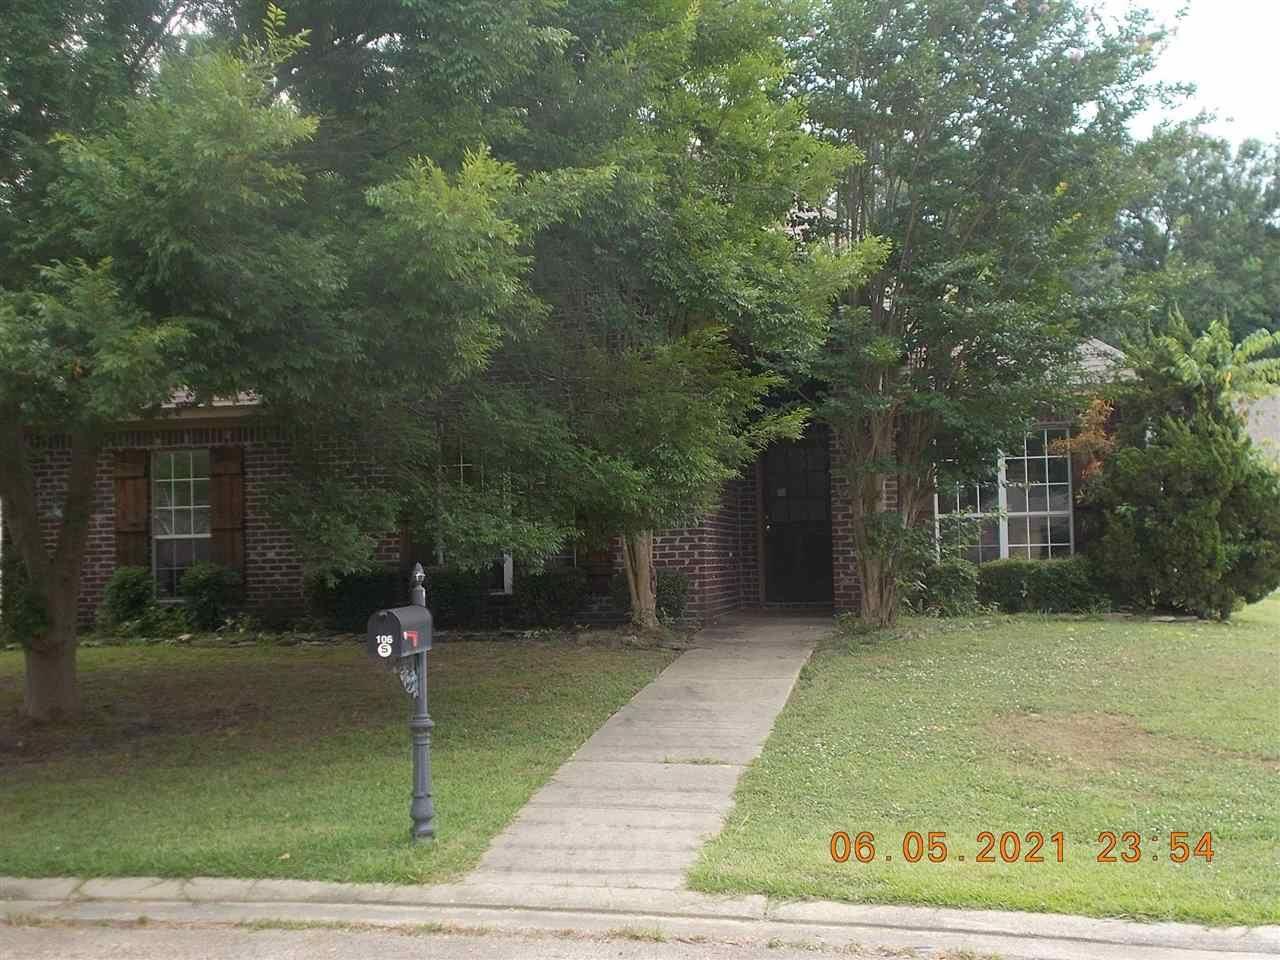 106 STAPLETON DR, Canton, MS 39046 - MLS#: 341698